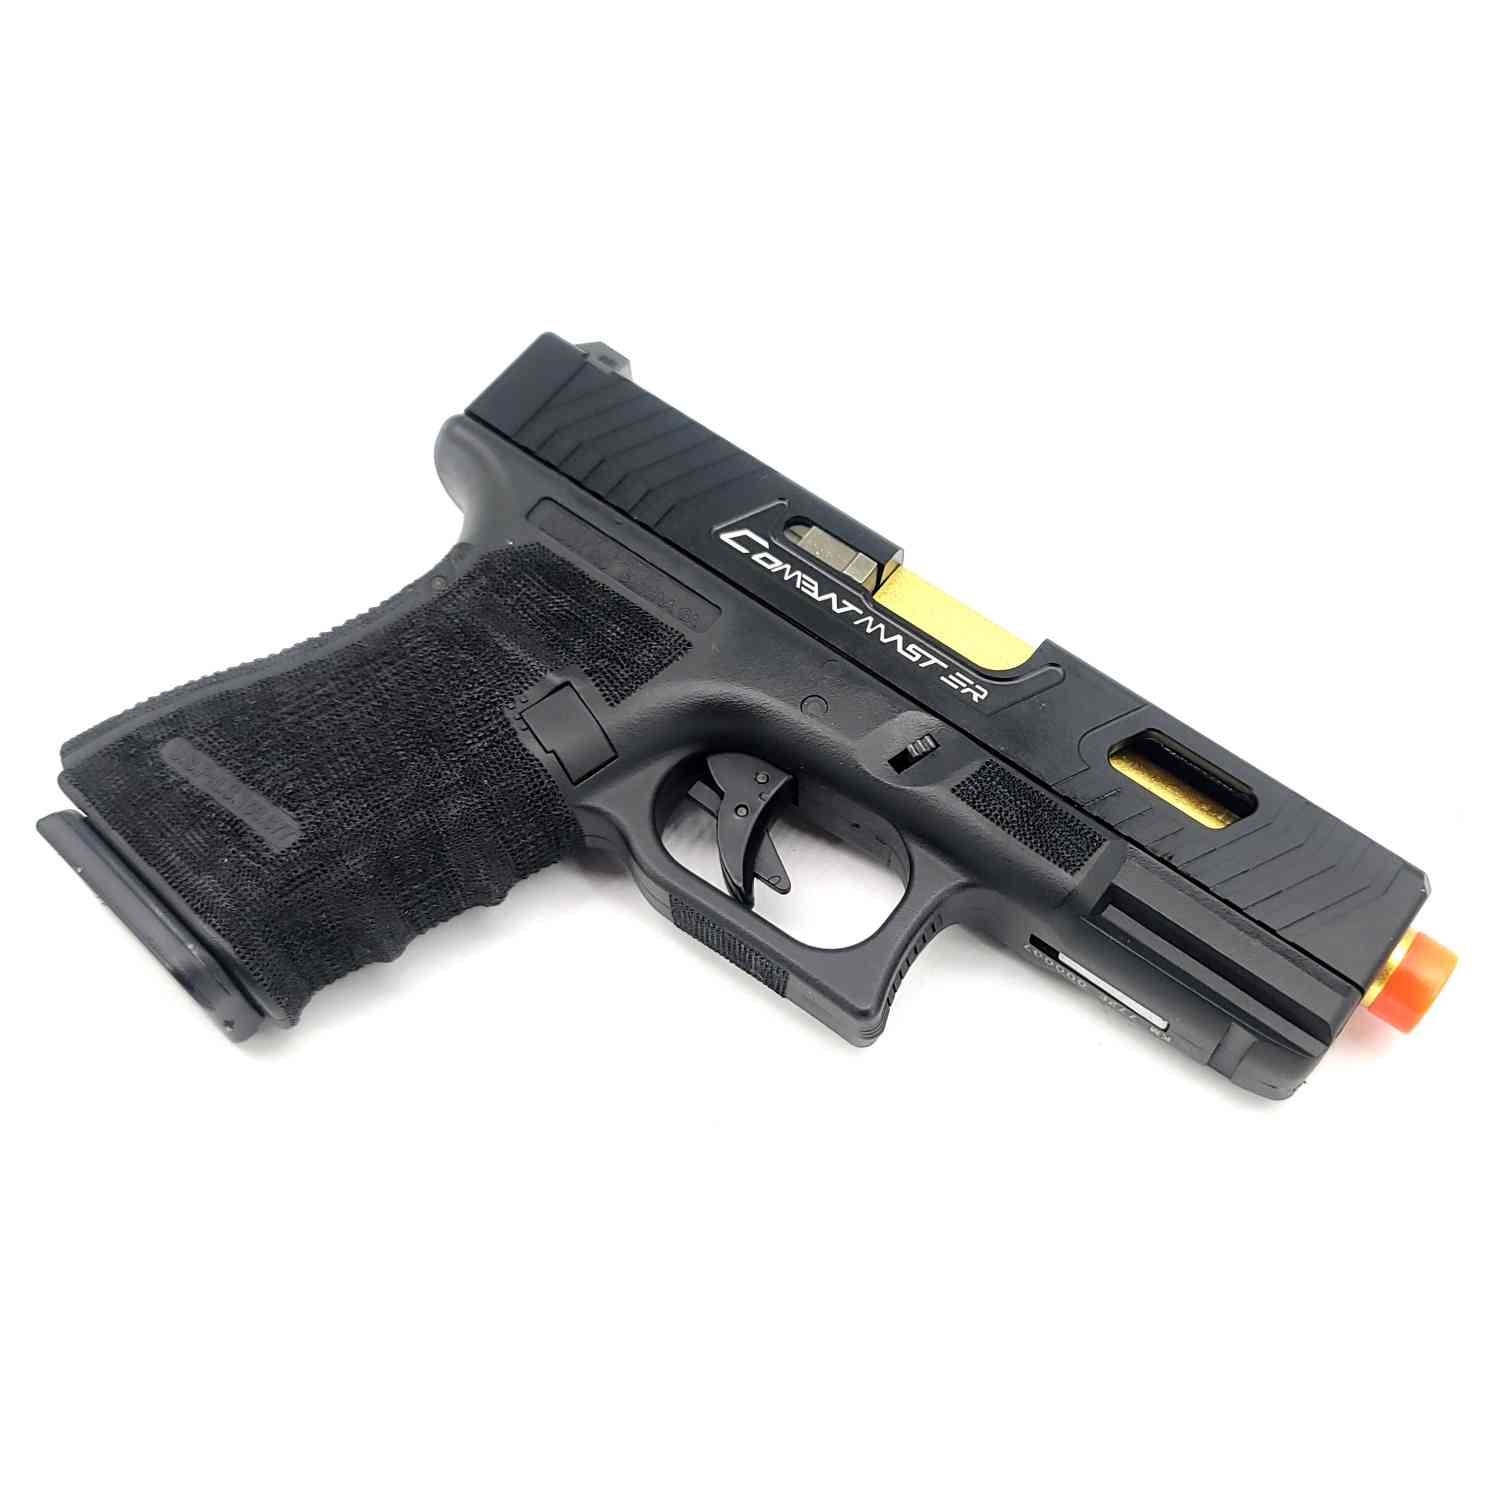 DOUBLE BELL Glock G19 TTI John Wick 2 Combat Master Custom Gas Powered Gel Blaster [772E] Renegade Blasters